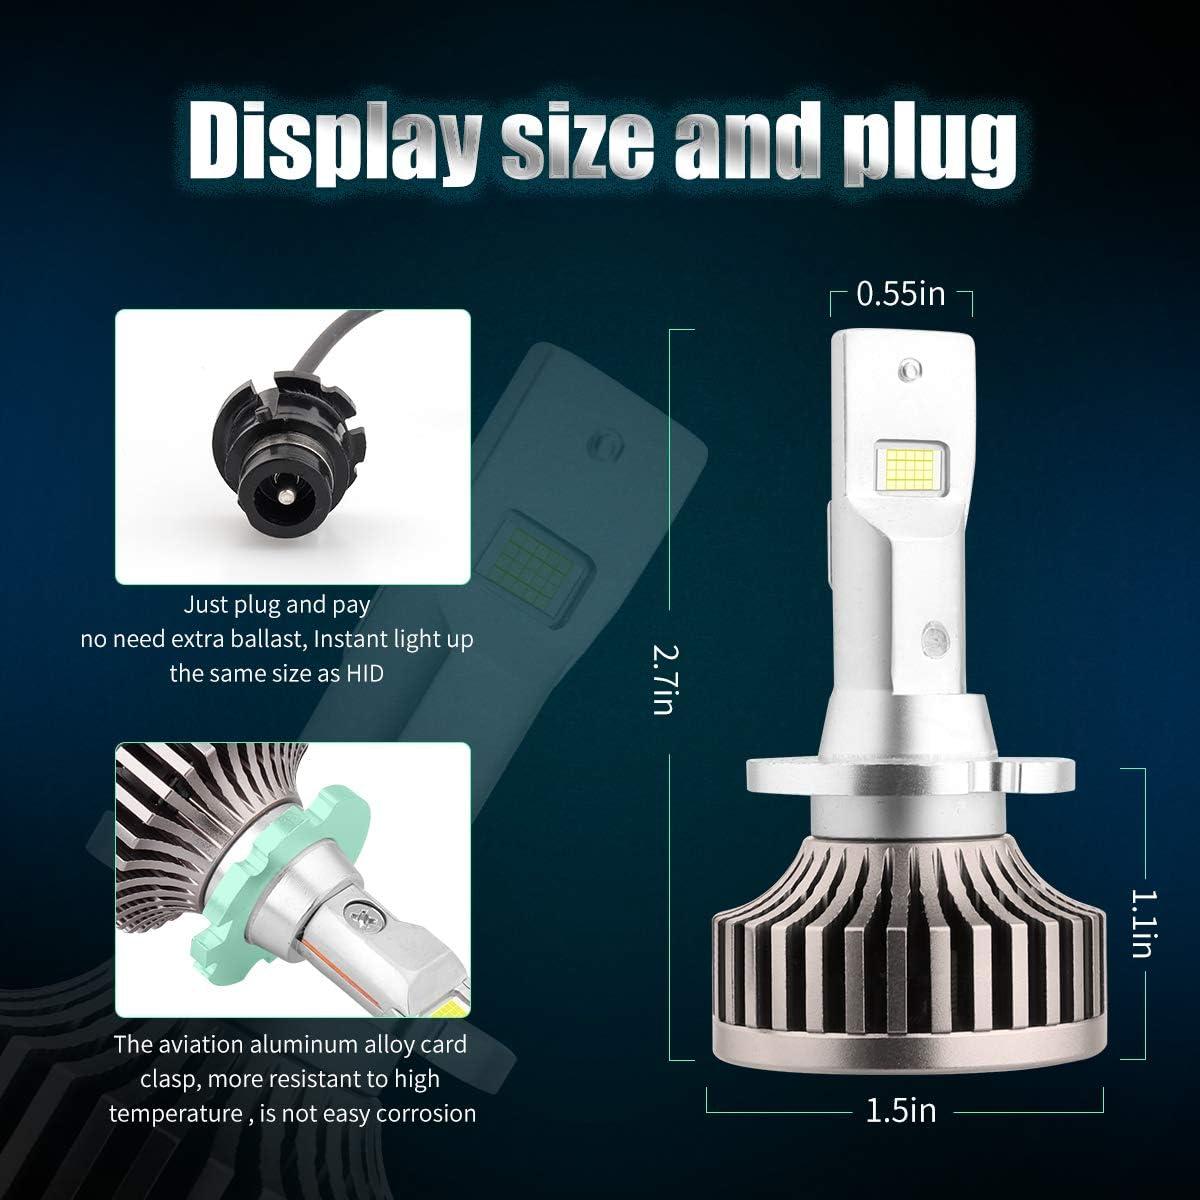 D4S D4R Led Headlight Bulb Conversion Kit 50W 10000LM Plug Play to Original D4S D4R D4C HID Ballast Canbus Error Free 6000K White